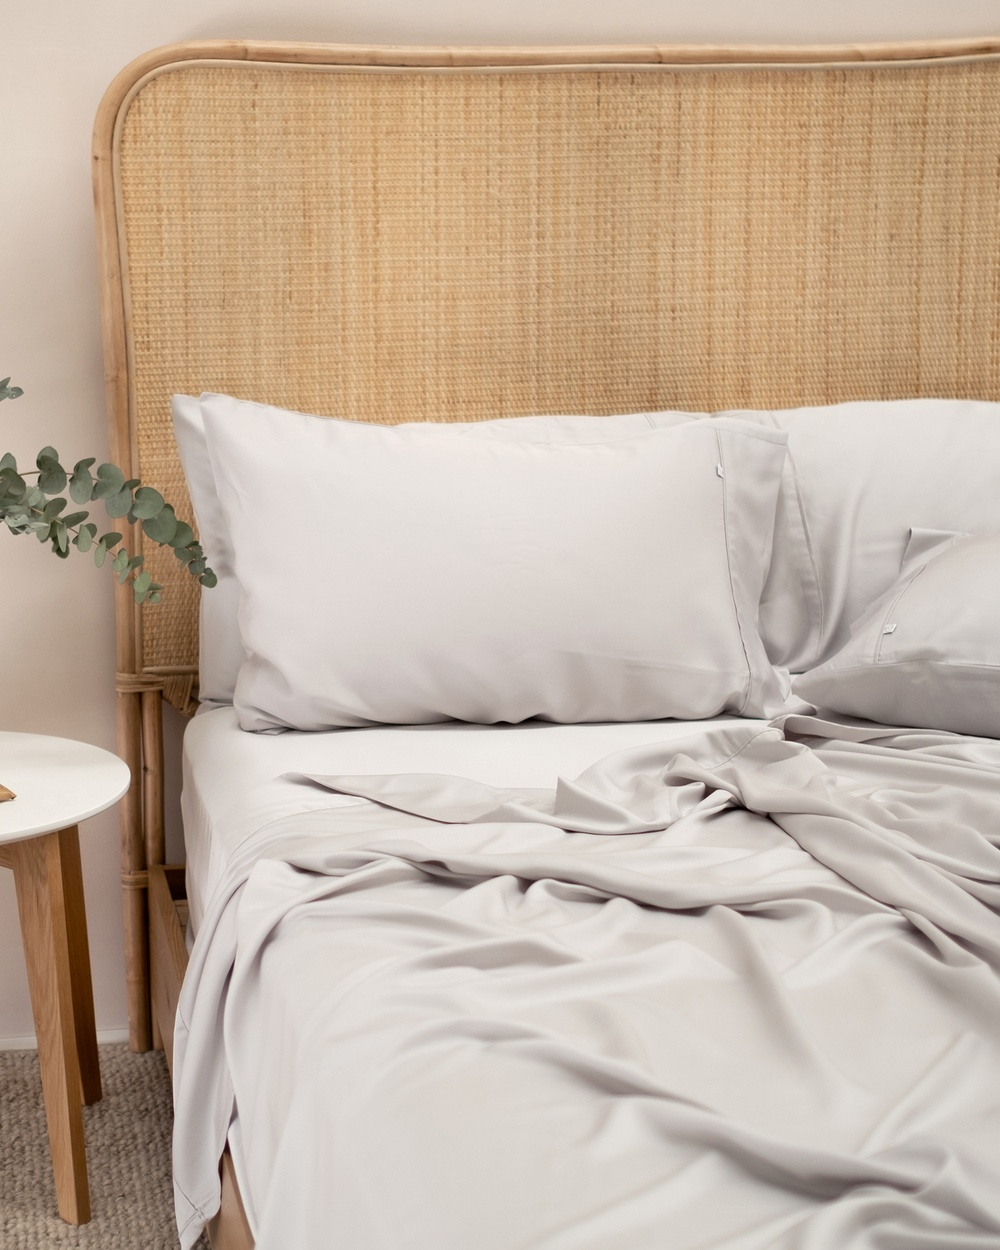 Mulberry Threads 100% Organic Bamboo Sheet Set Home Silver